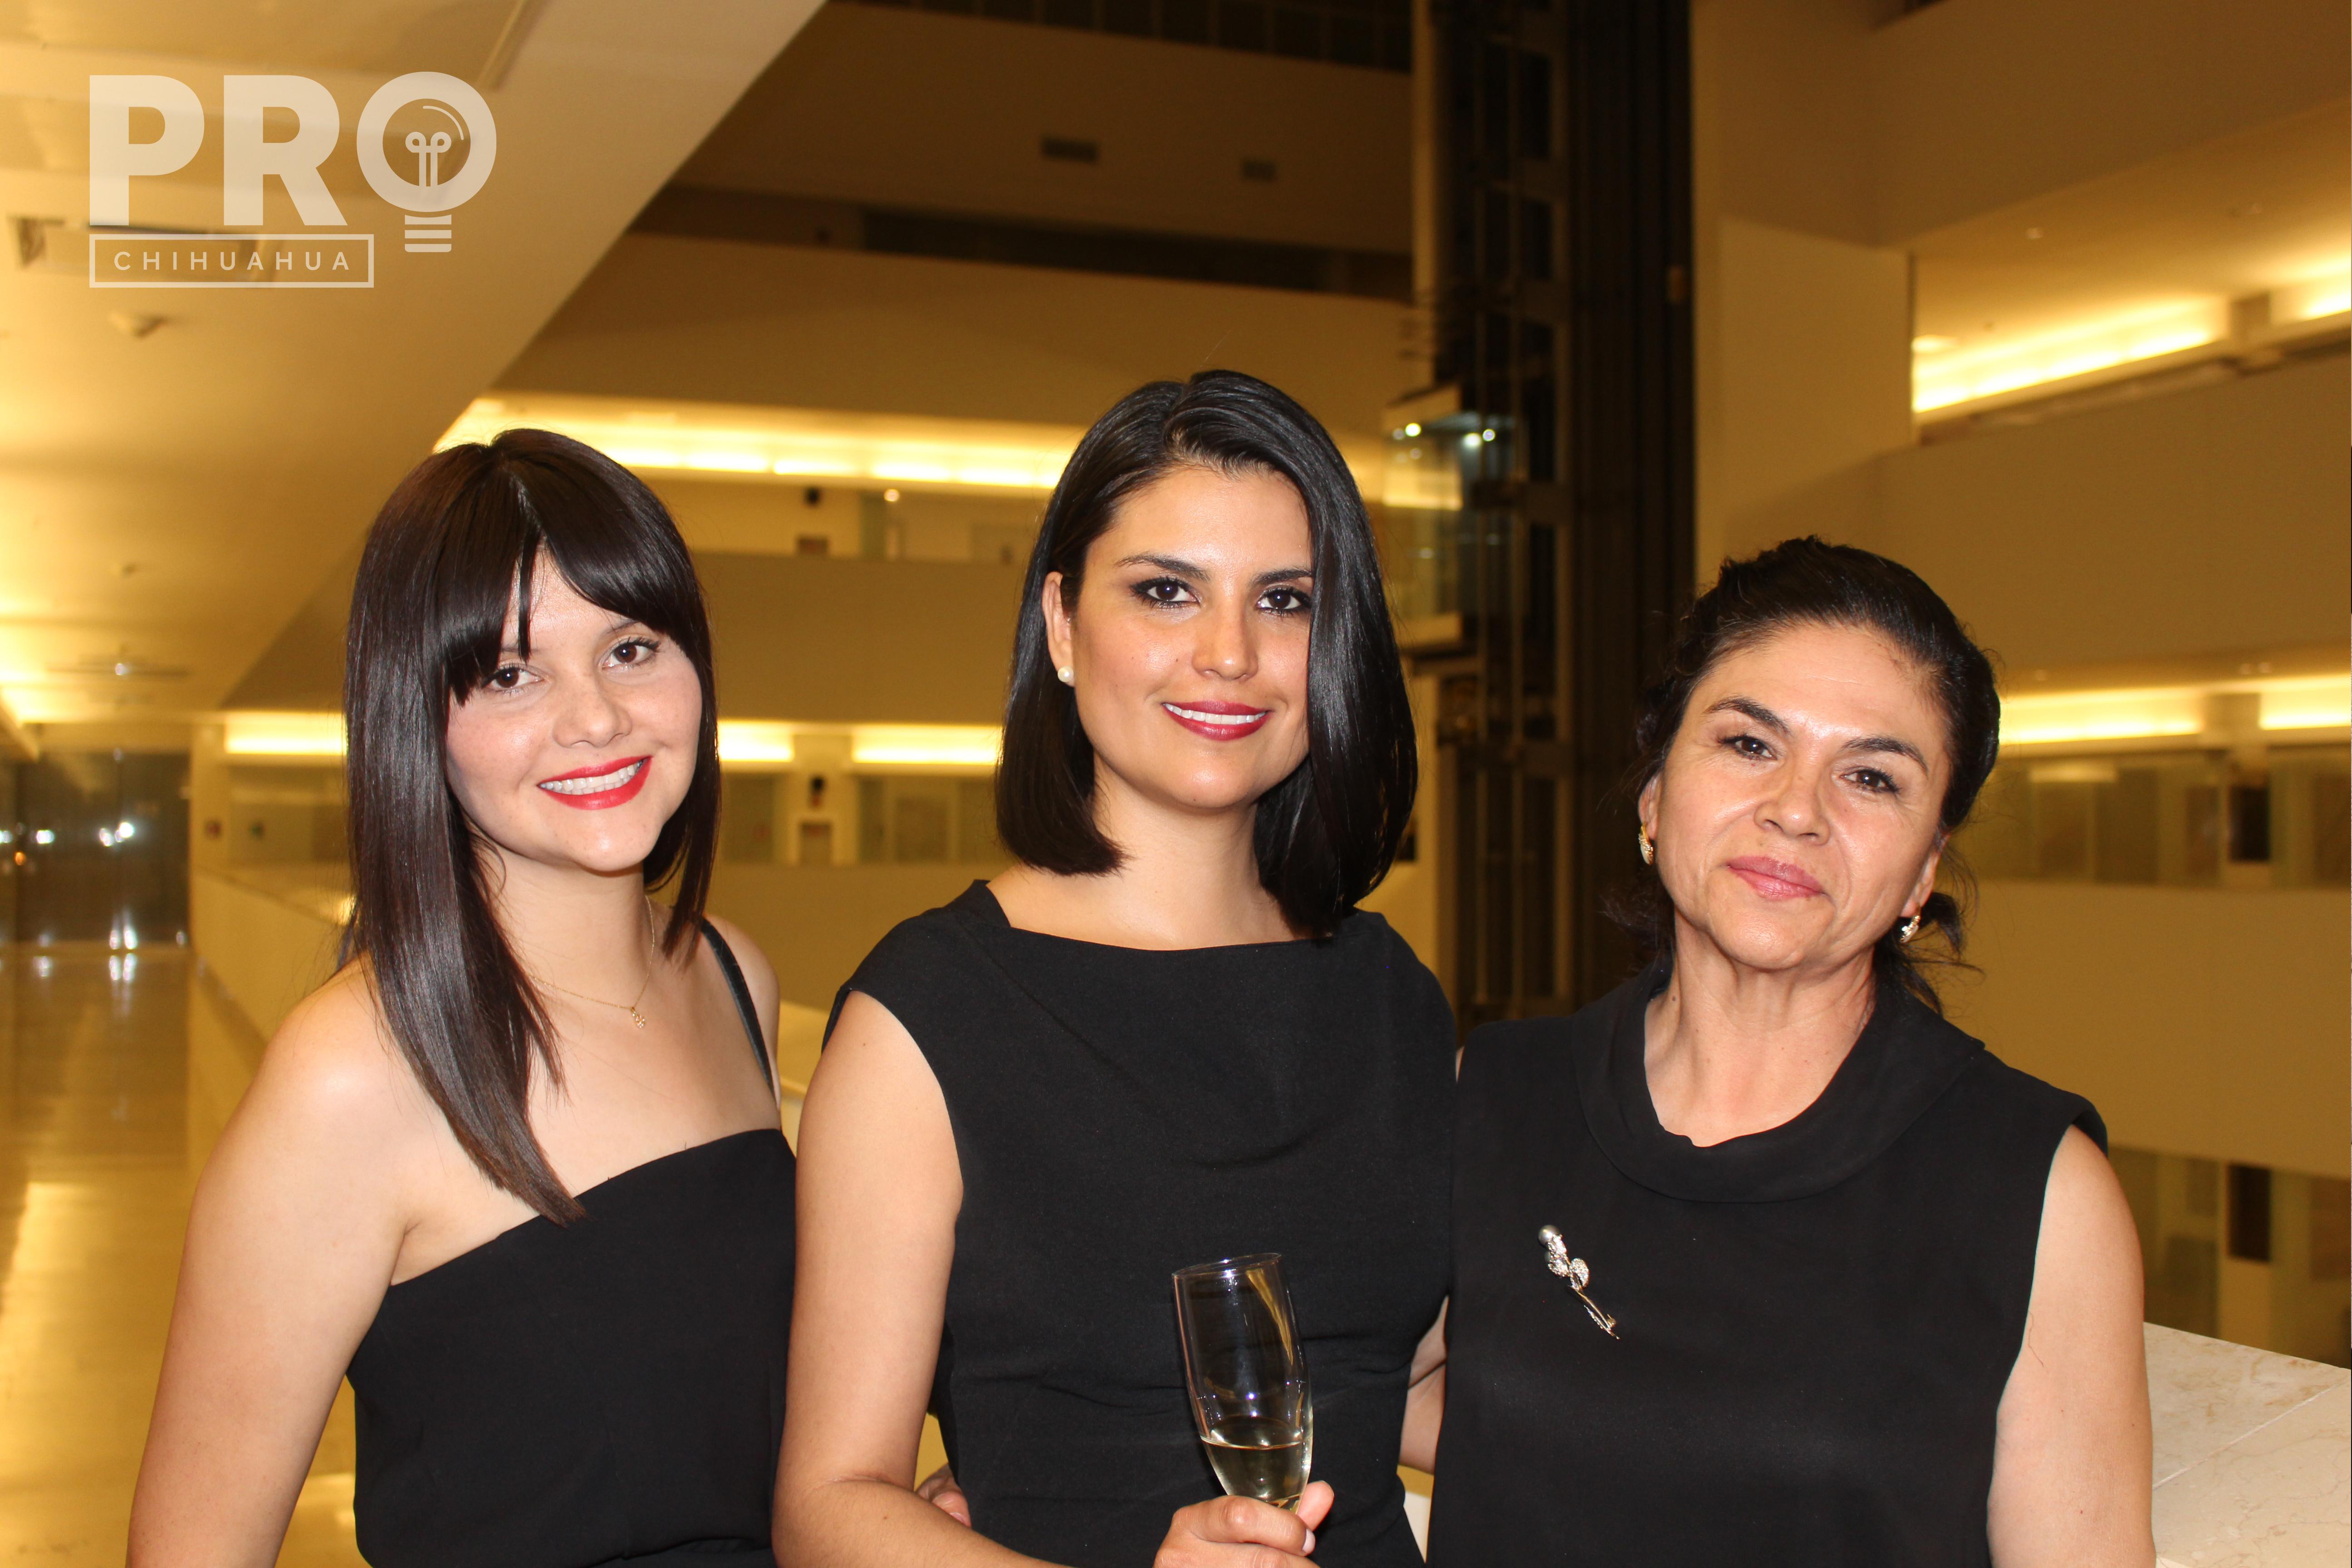 Maryeth Gutiérrez, Dra. Nereida Gutiérrez y Nereida Saldaña 0625.- Familia Rodríguez